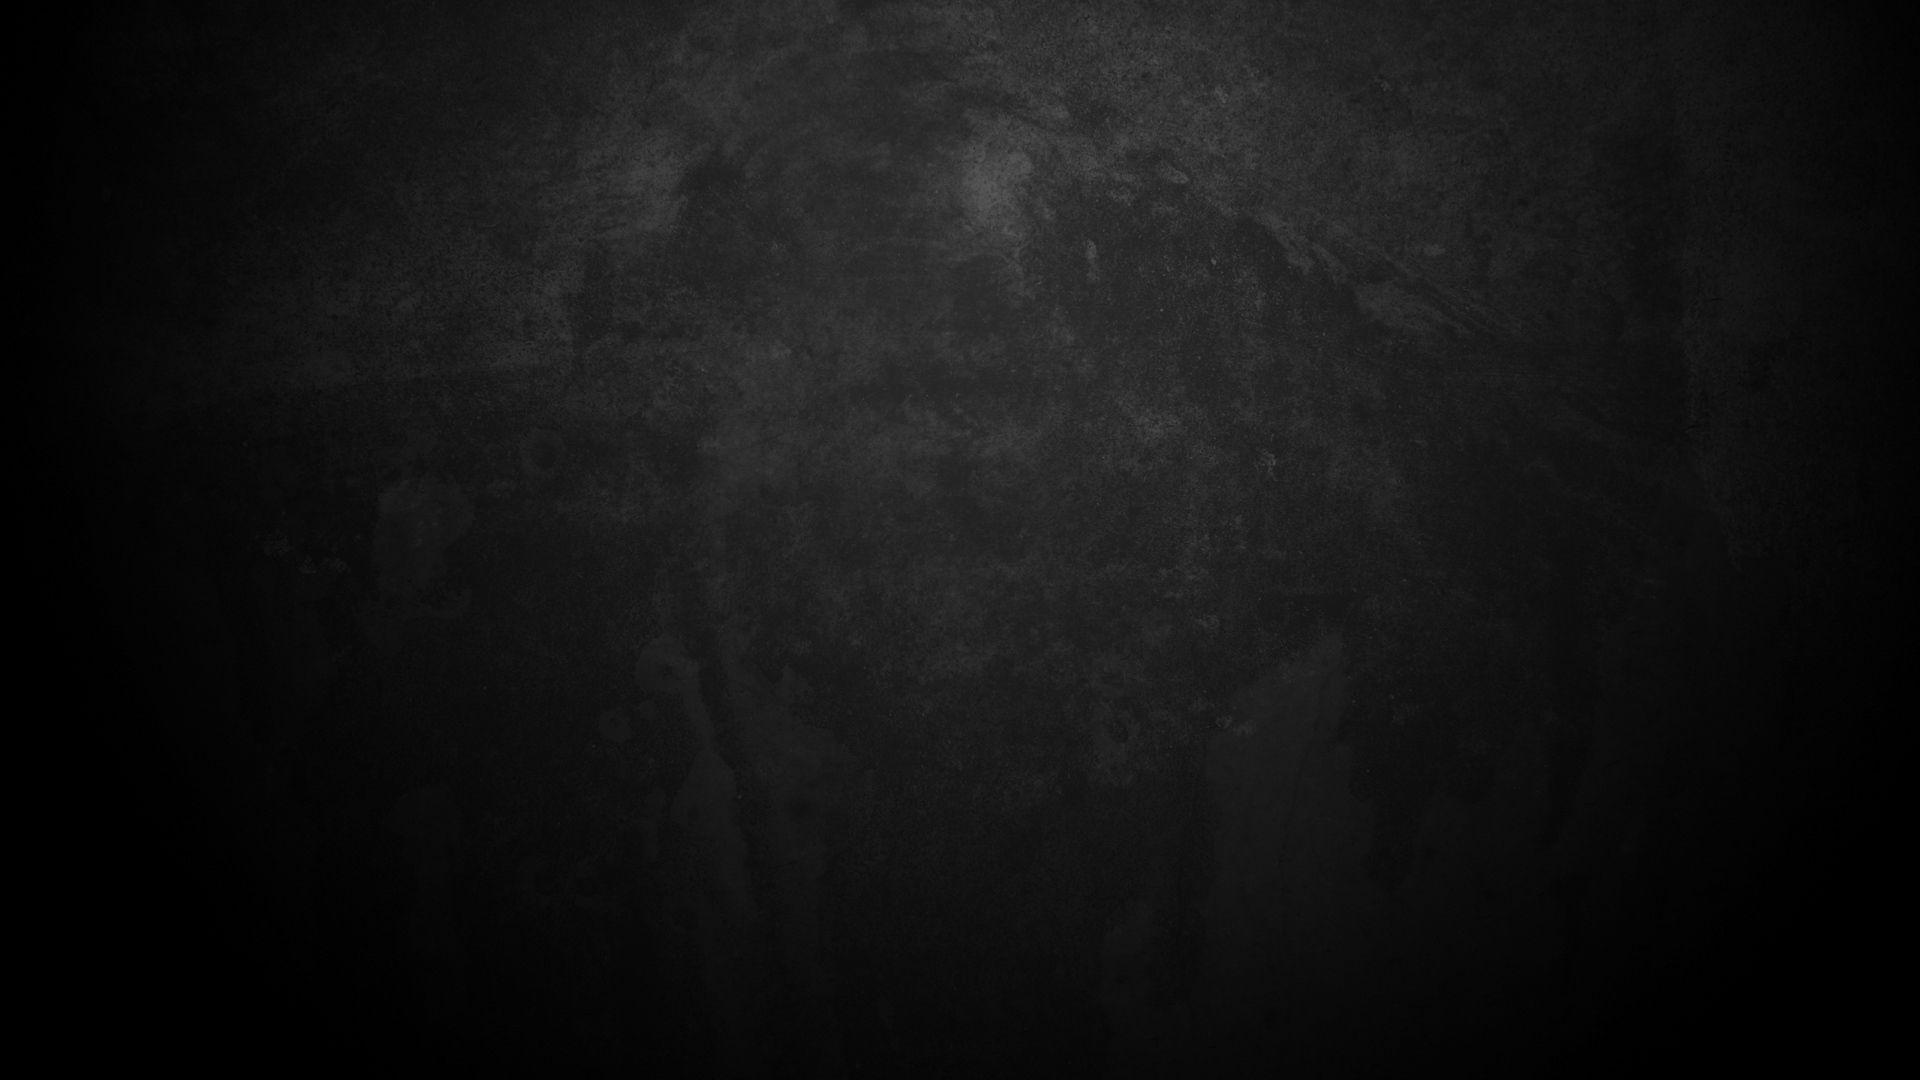 Dark Wallpaper Background Best Wallpaper Hd Dark Desktop Backgrounds Black Background Wallpaper Dark Wallpaper